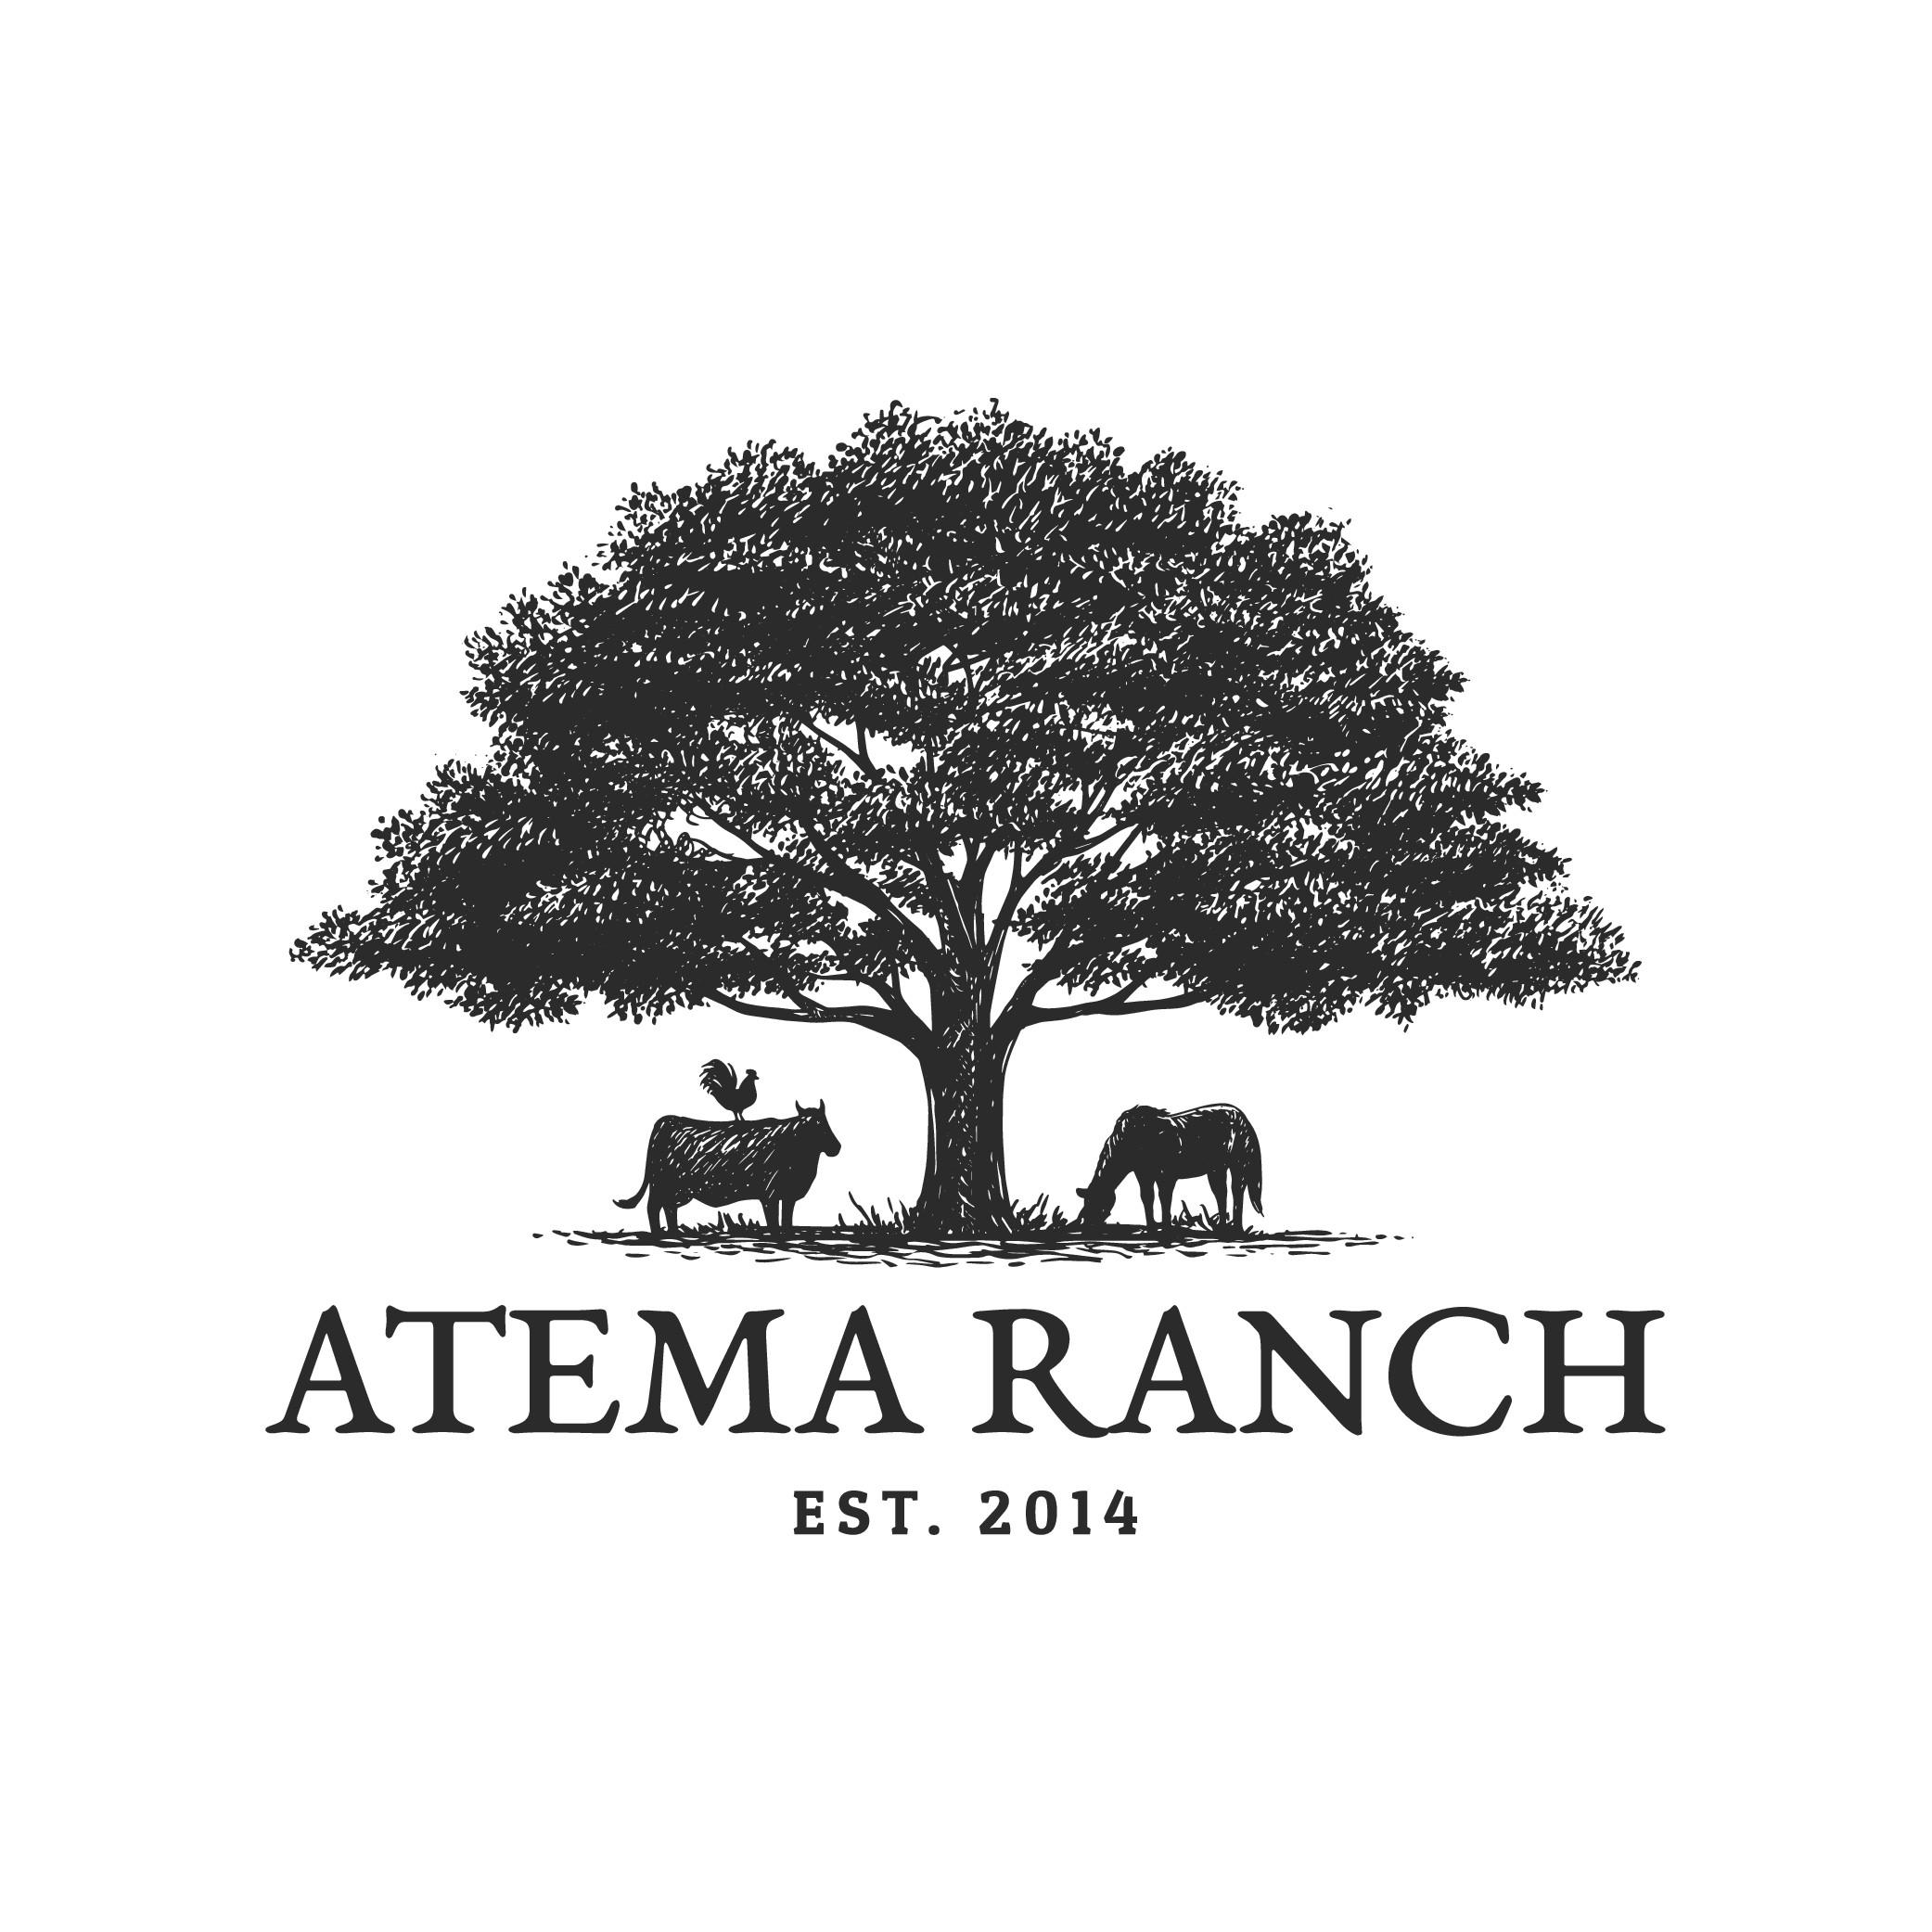 Creative new farm logo for our family ranch!